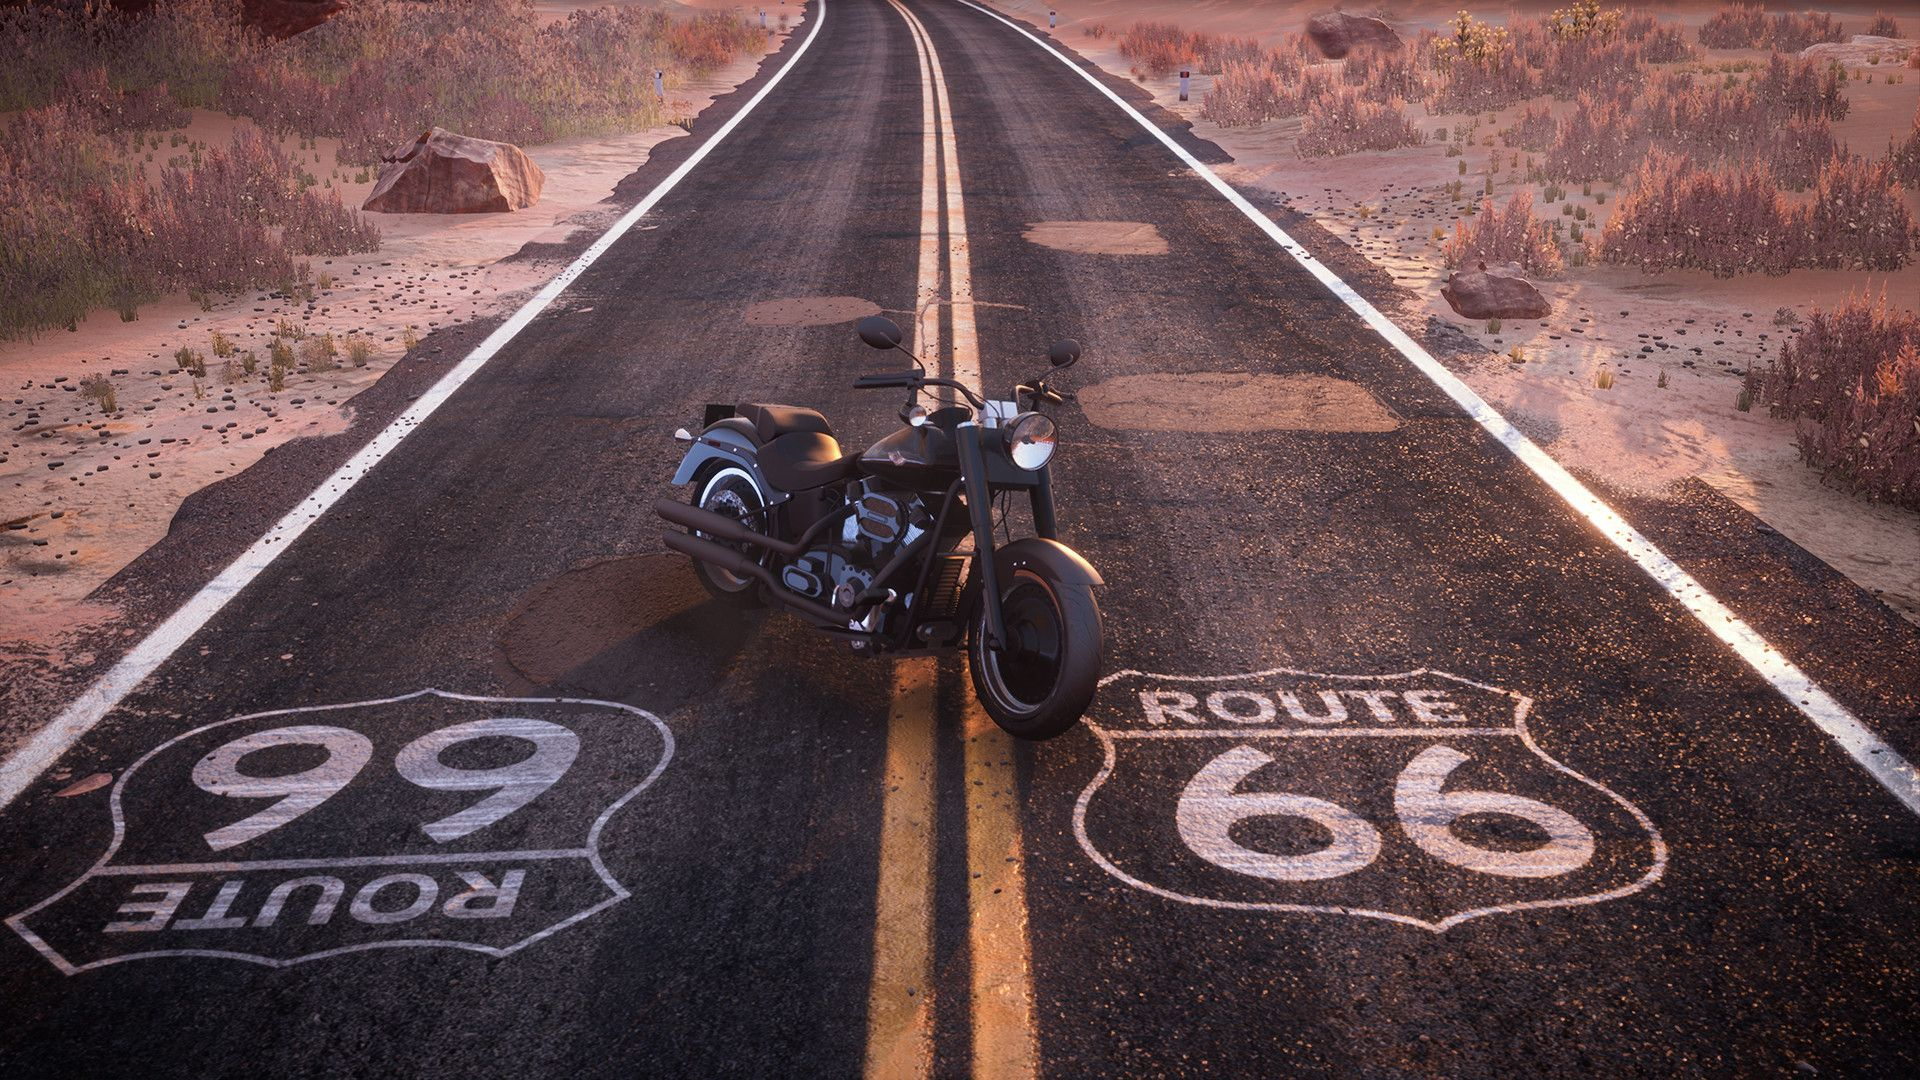 American Biker Rider Work Shirt Route 66 Shirt Highway Motorcycle